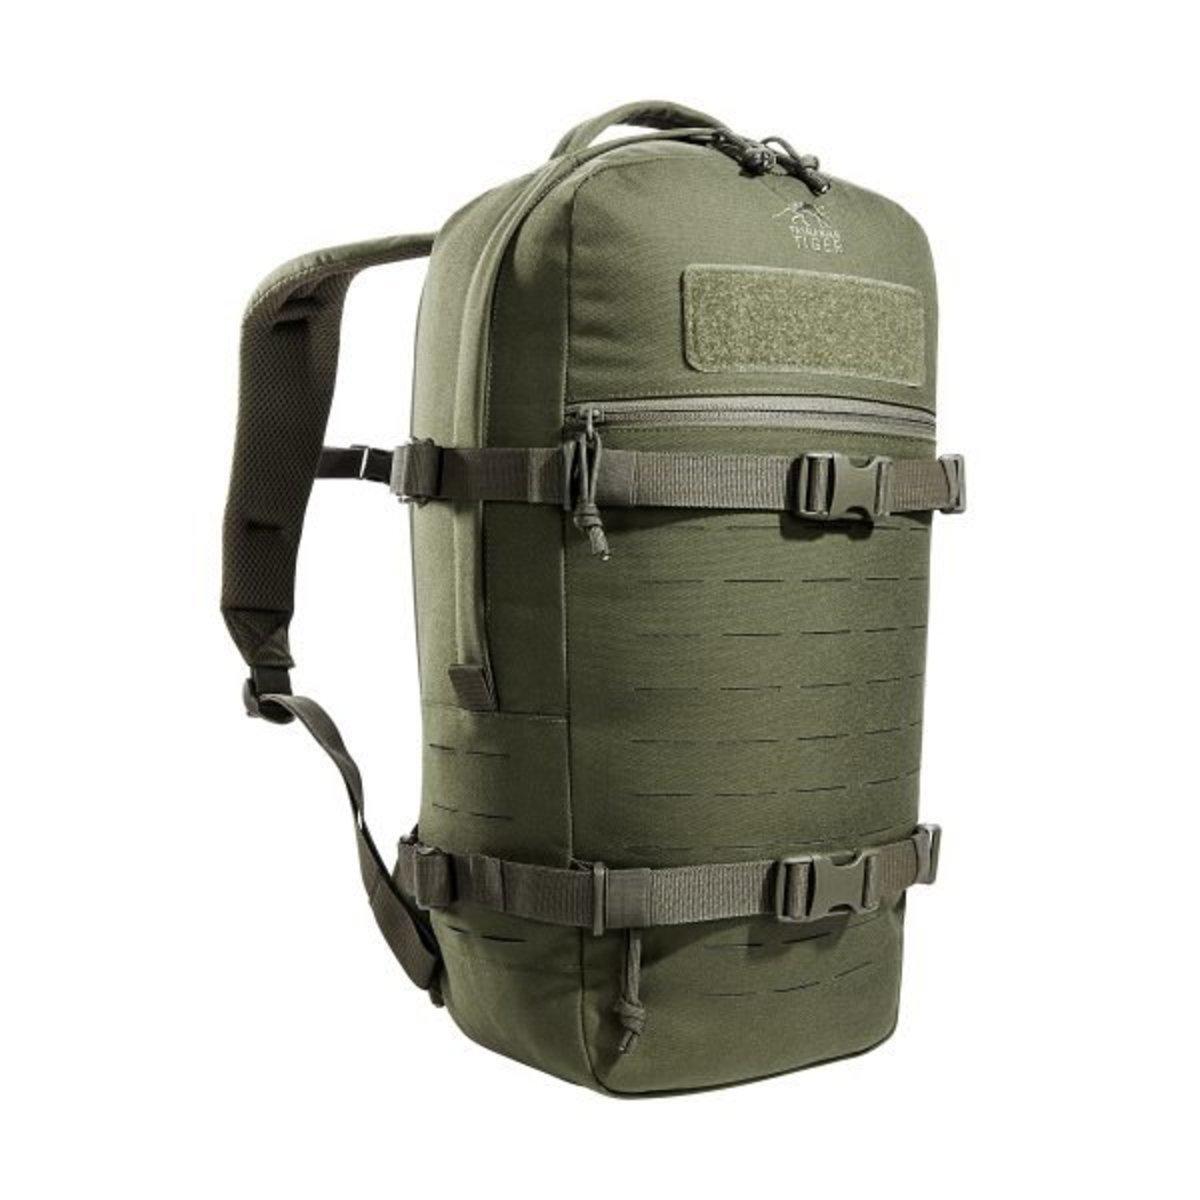 TT Modular Daypack L Olive